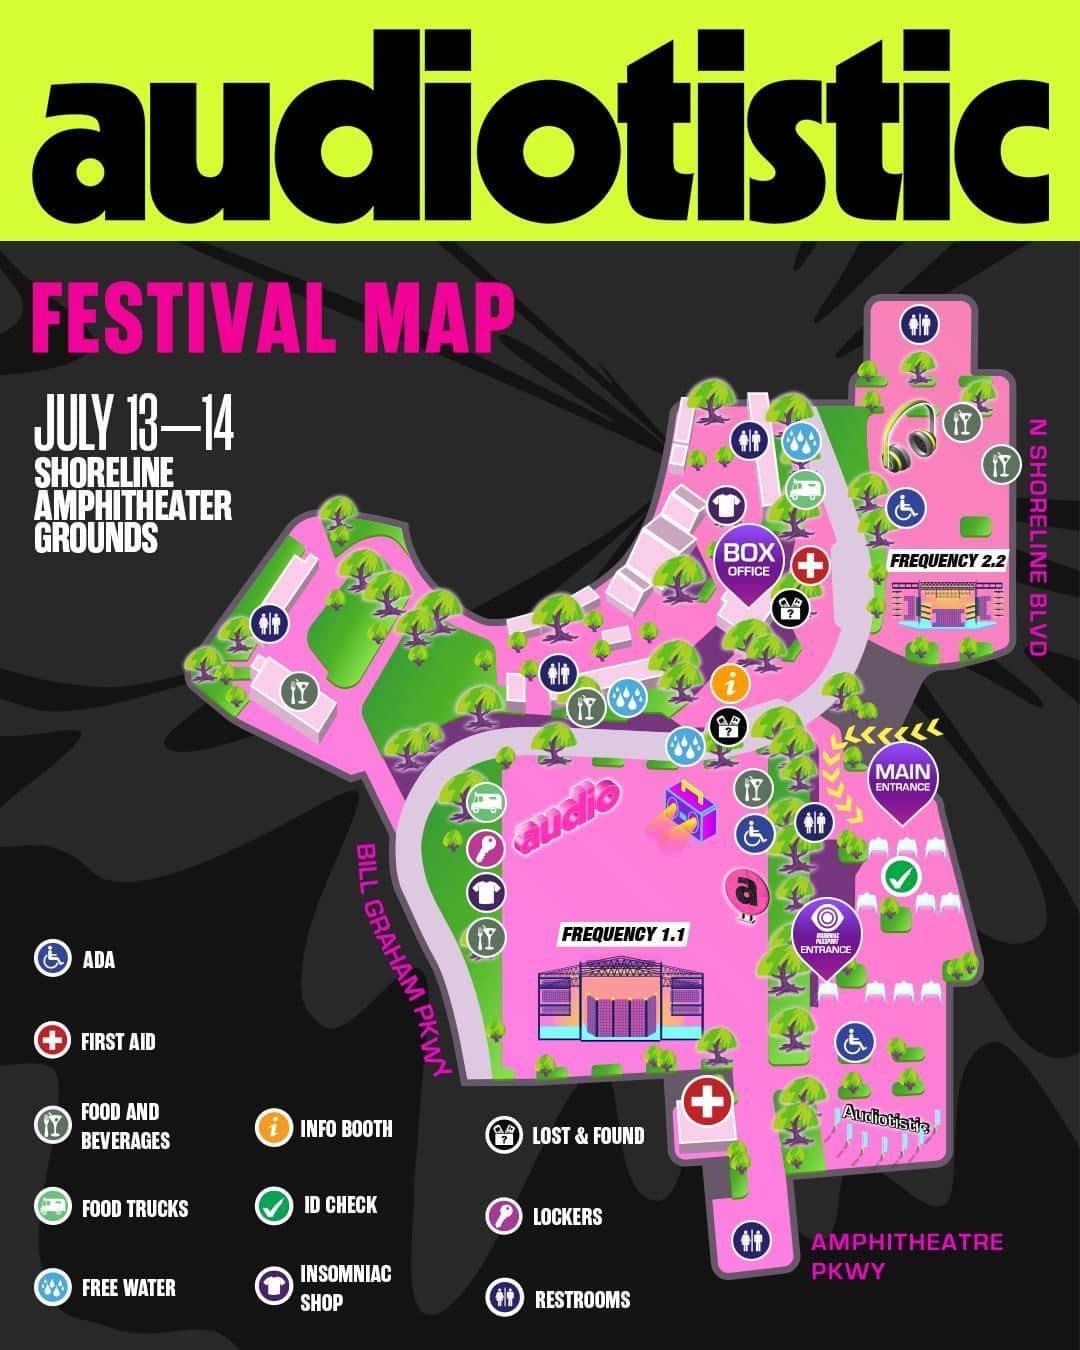 Audiotistic Bay Area 2019 Festival Map